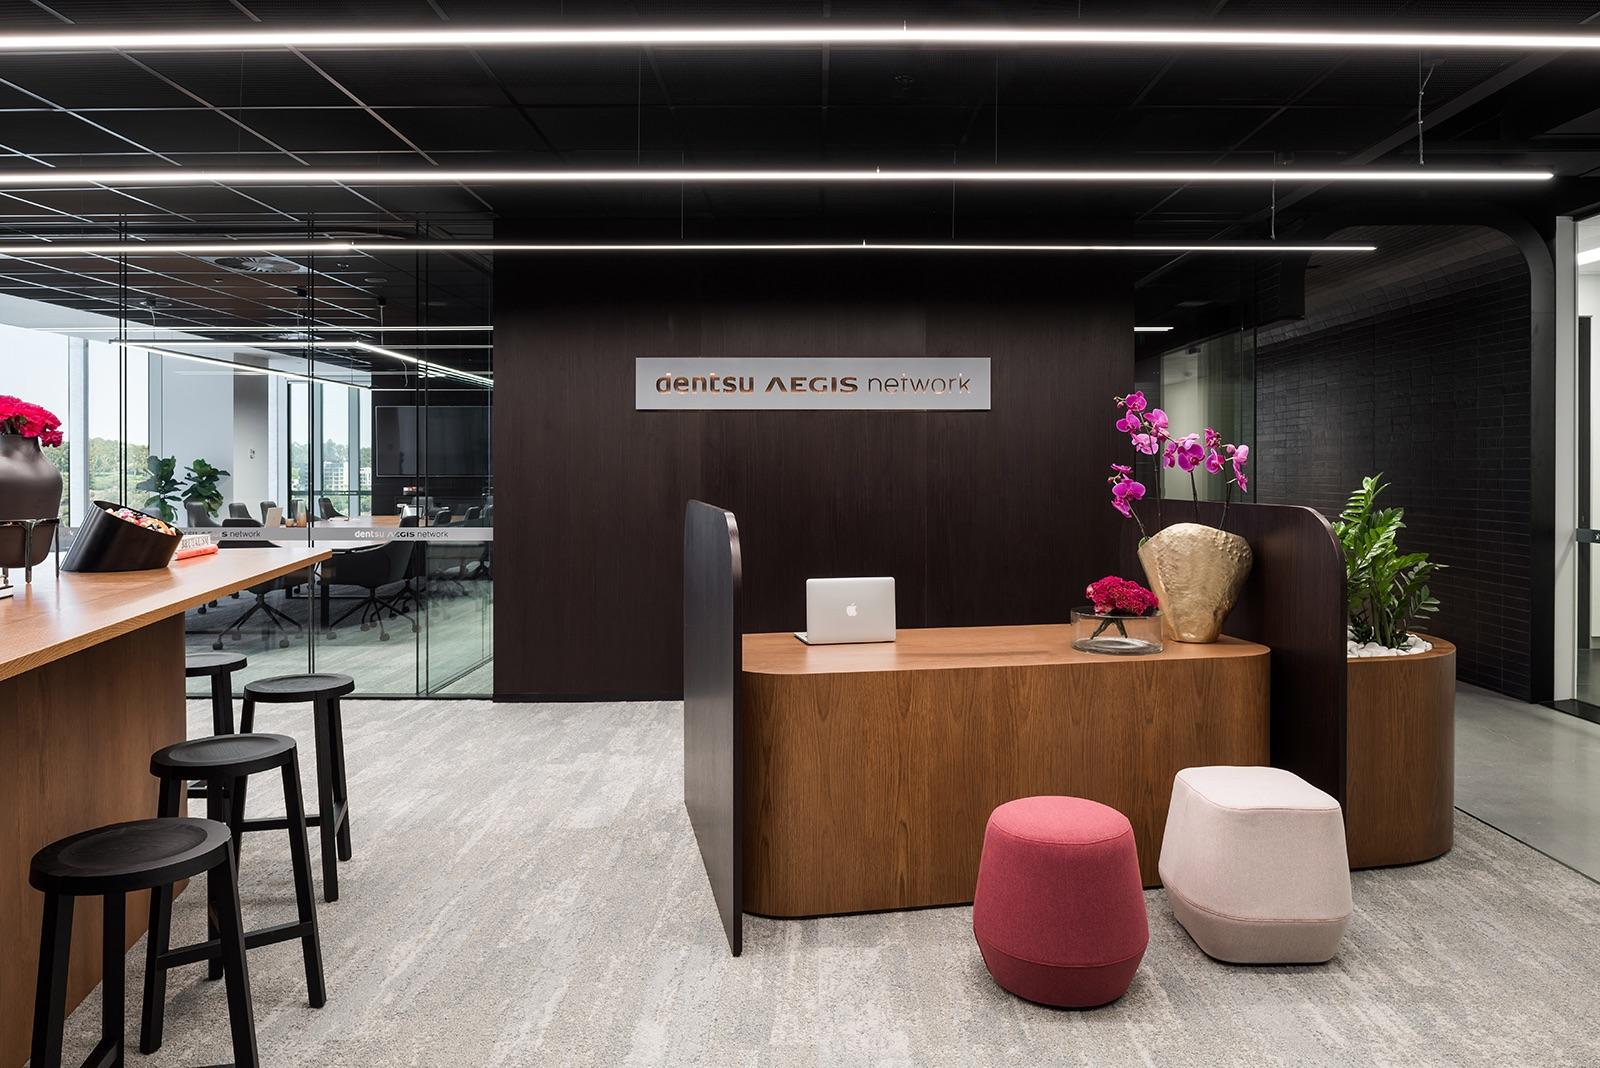 dentsu-aegis-network-office-2